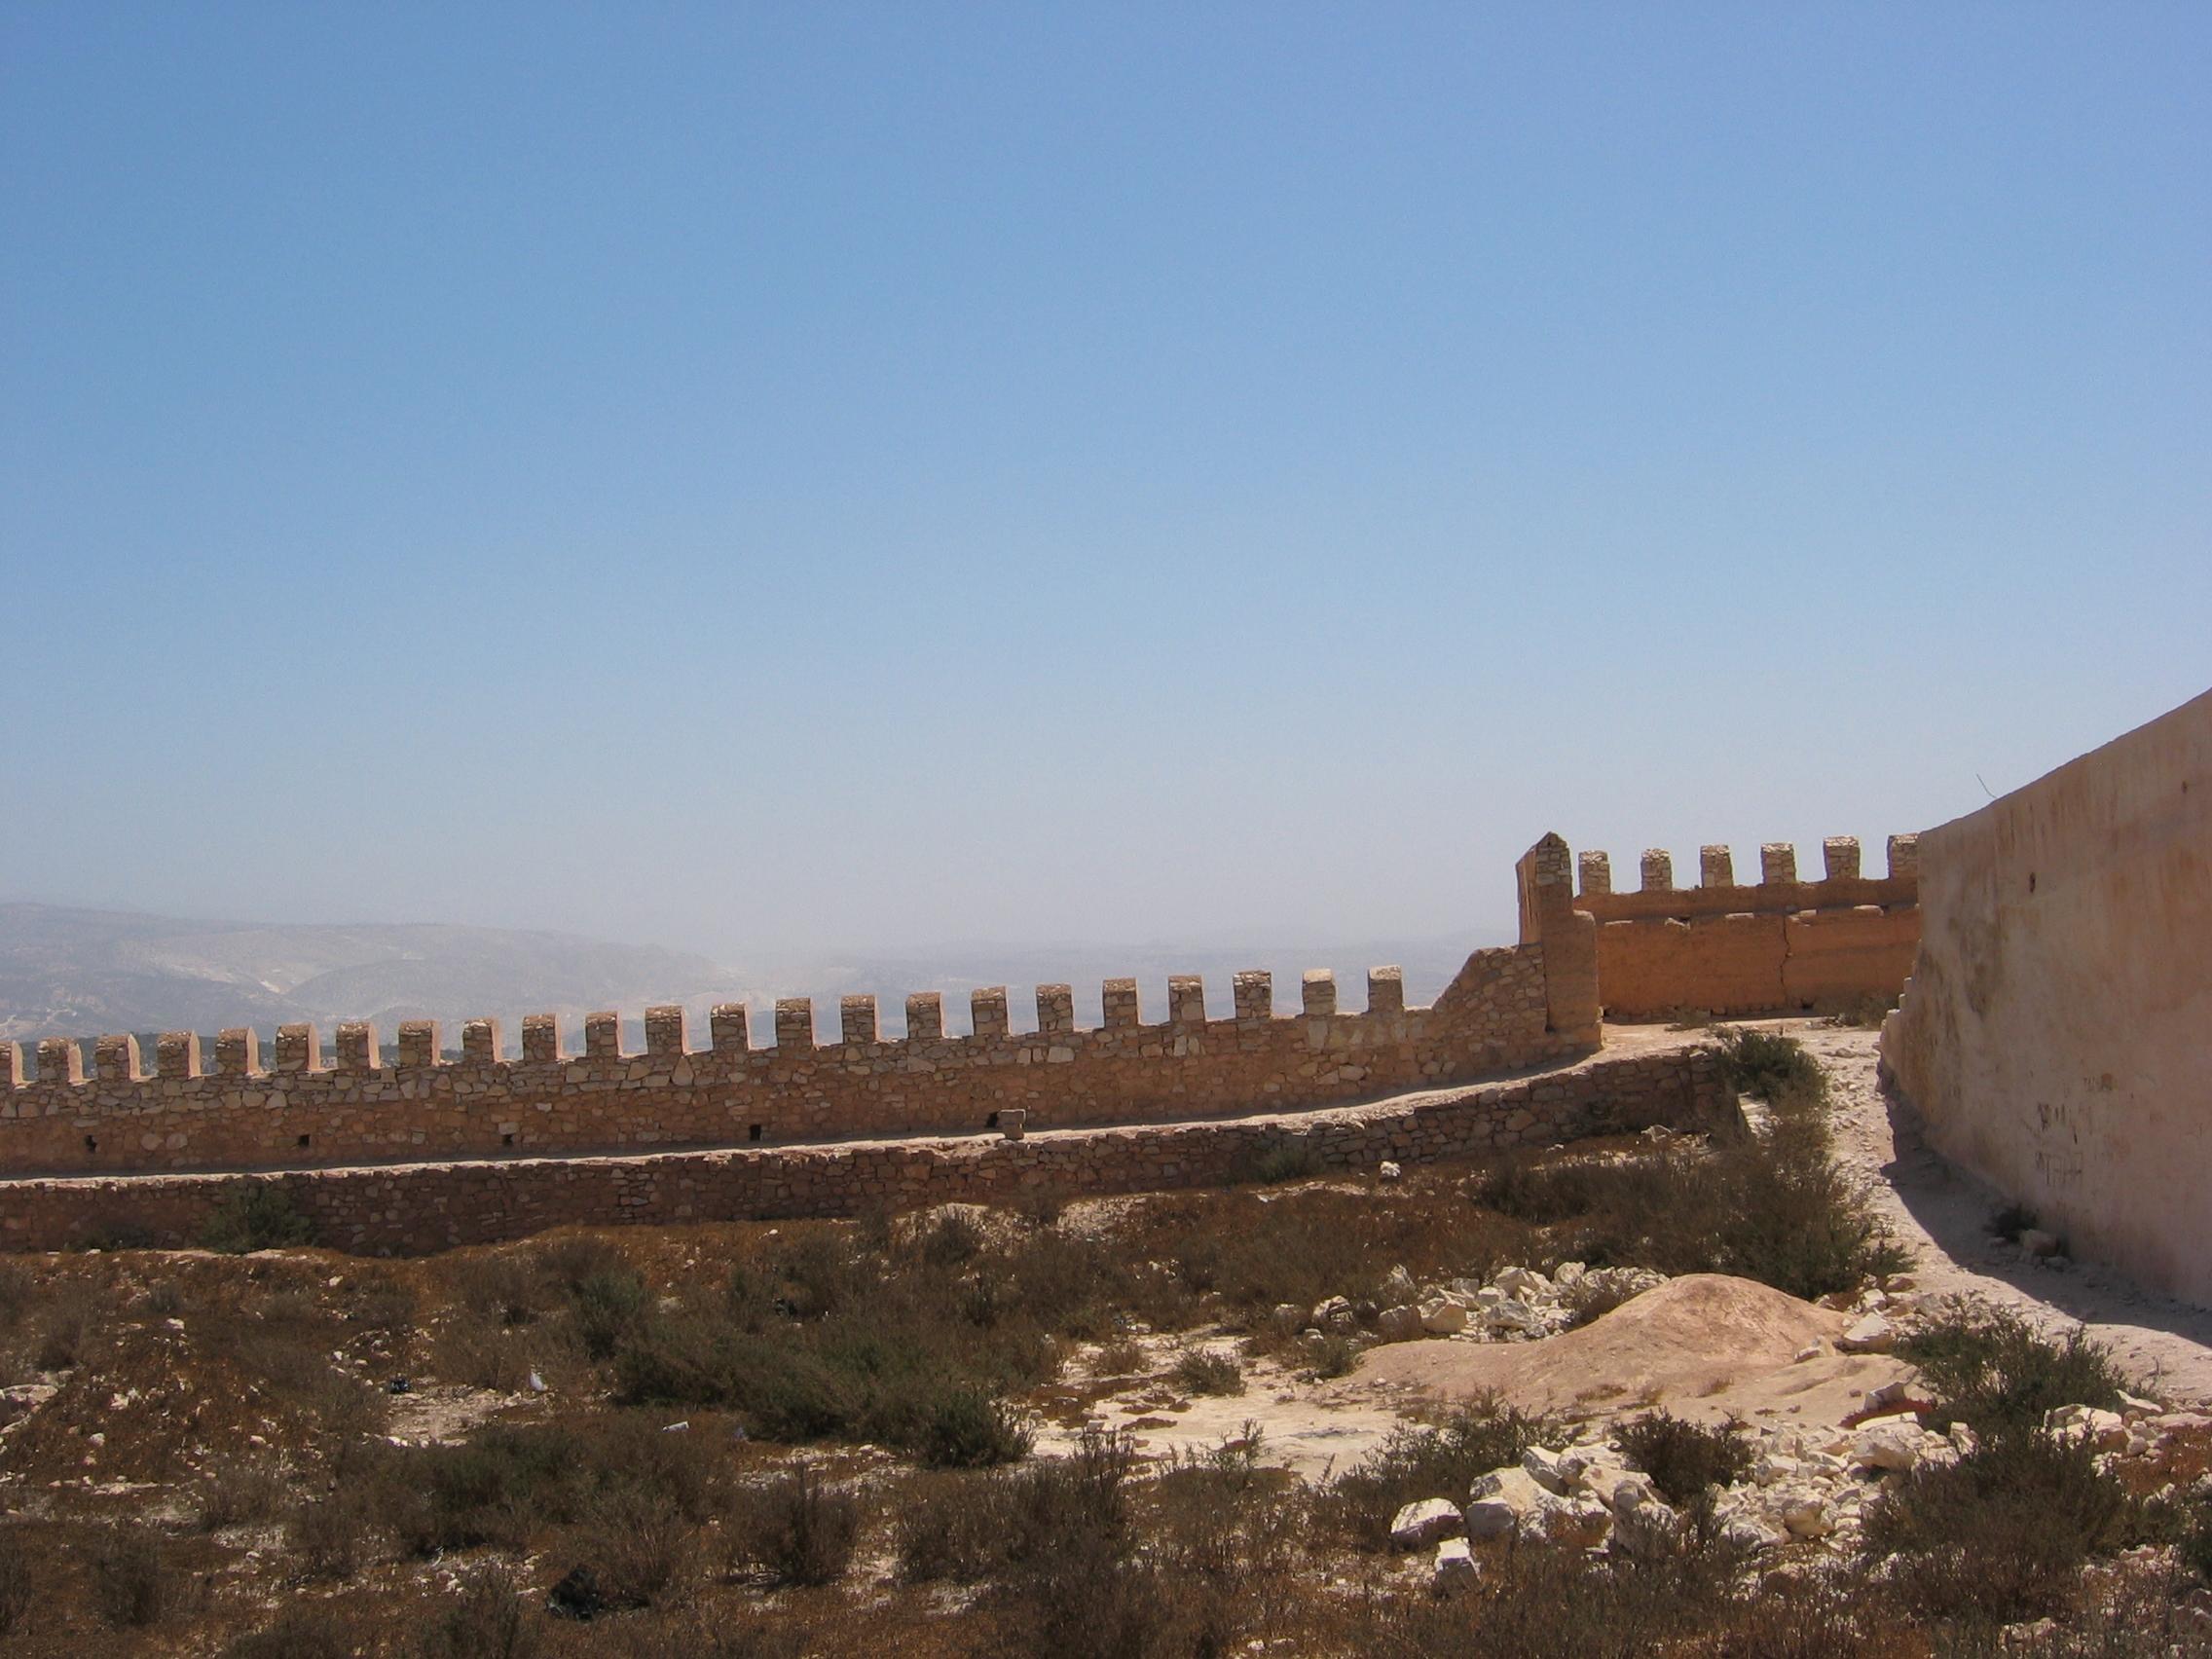 Agadir Kasbah: Address, Agadir Kasbah Reviews: 5/5